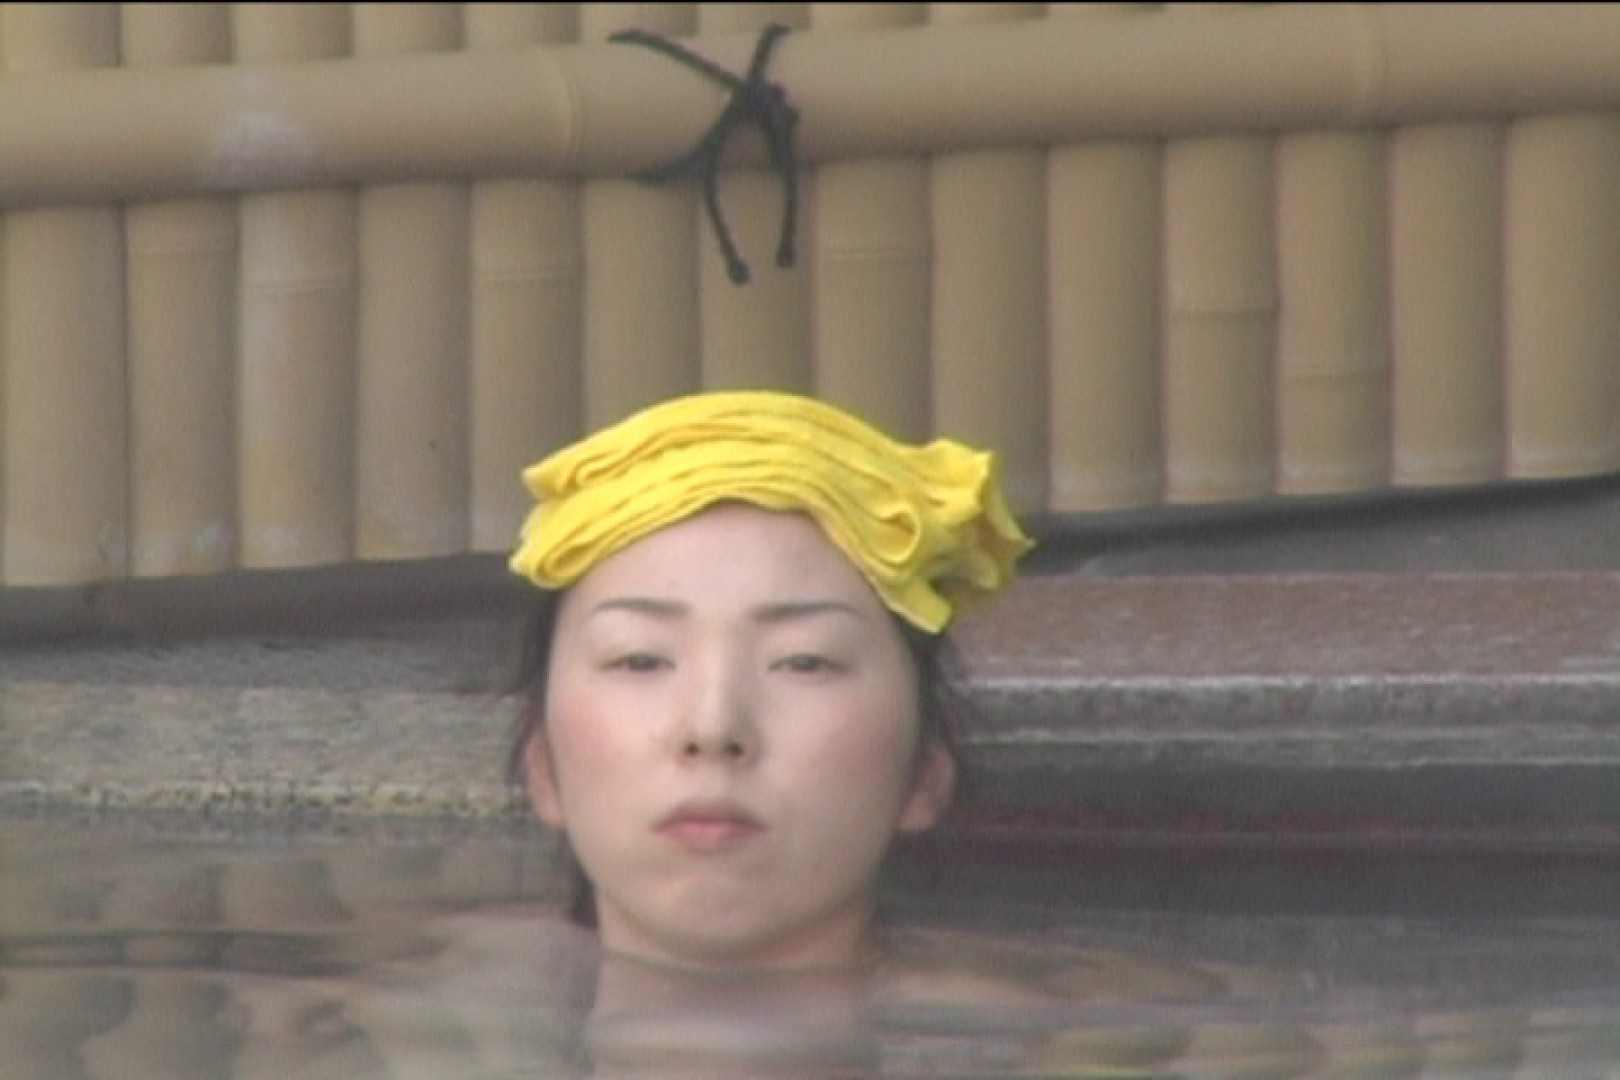 Aquaな露天風呂Vol.529 OLのエロ生活 おめこ無修正画像 42連発 8